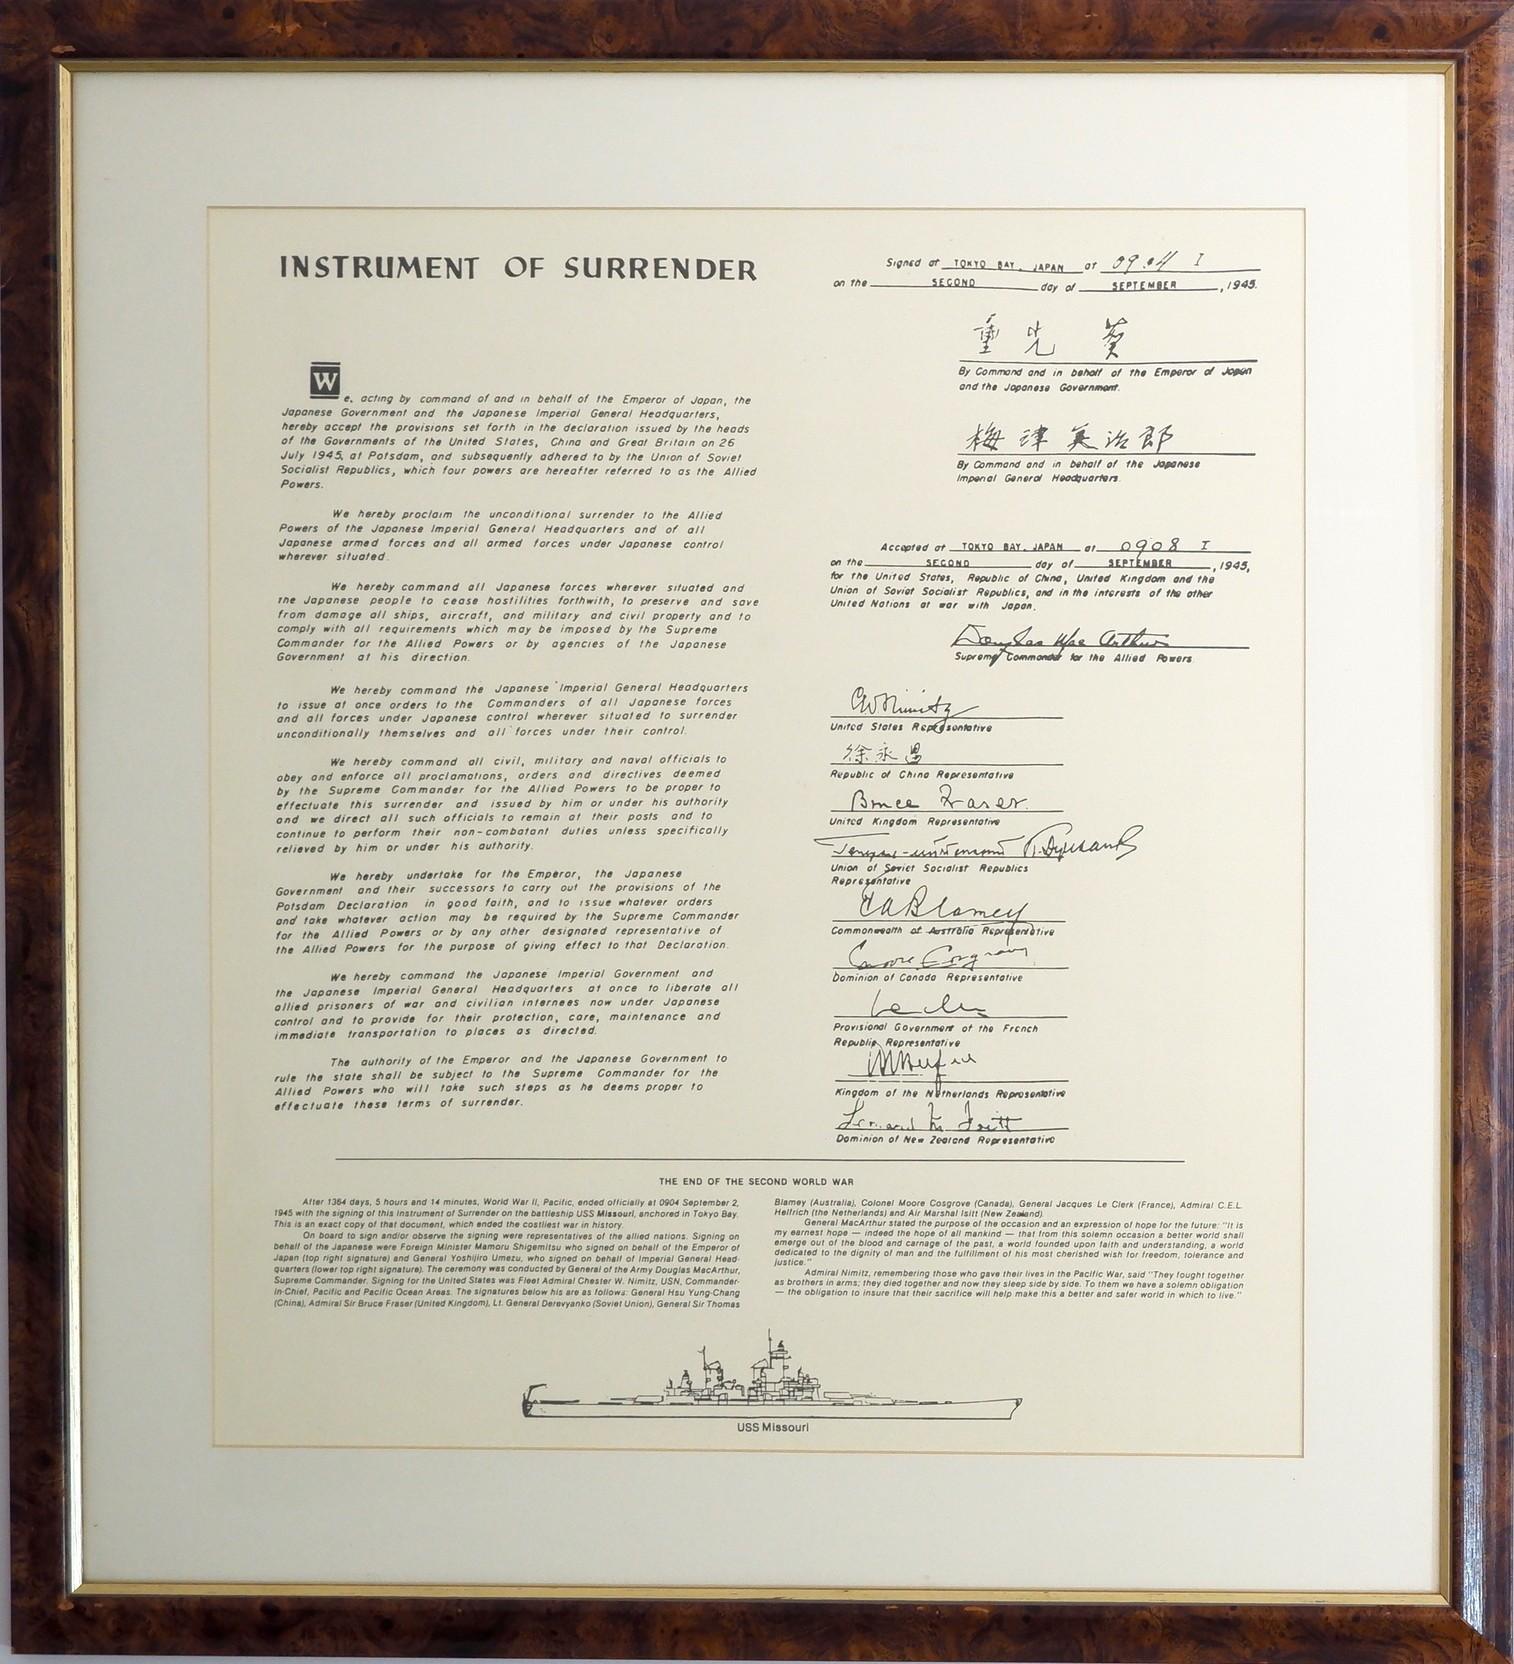 'Framed Print of the Japanese Instrument of Surrender'